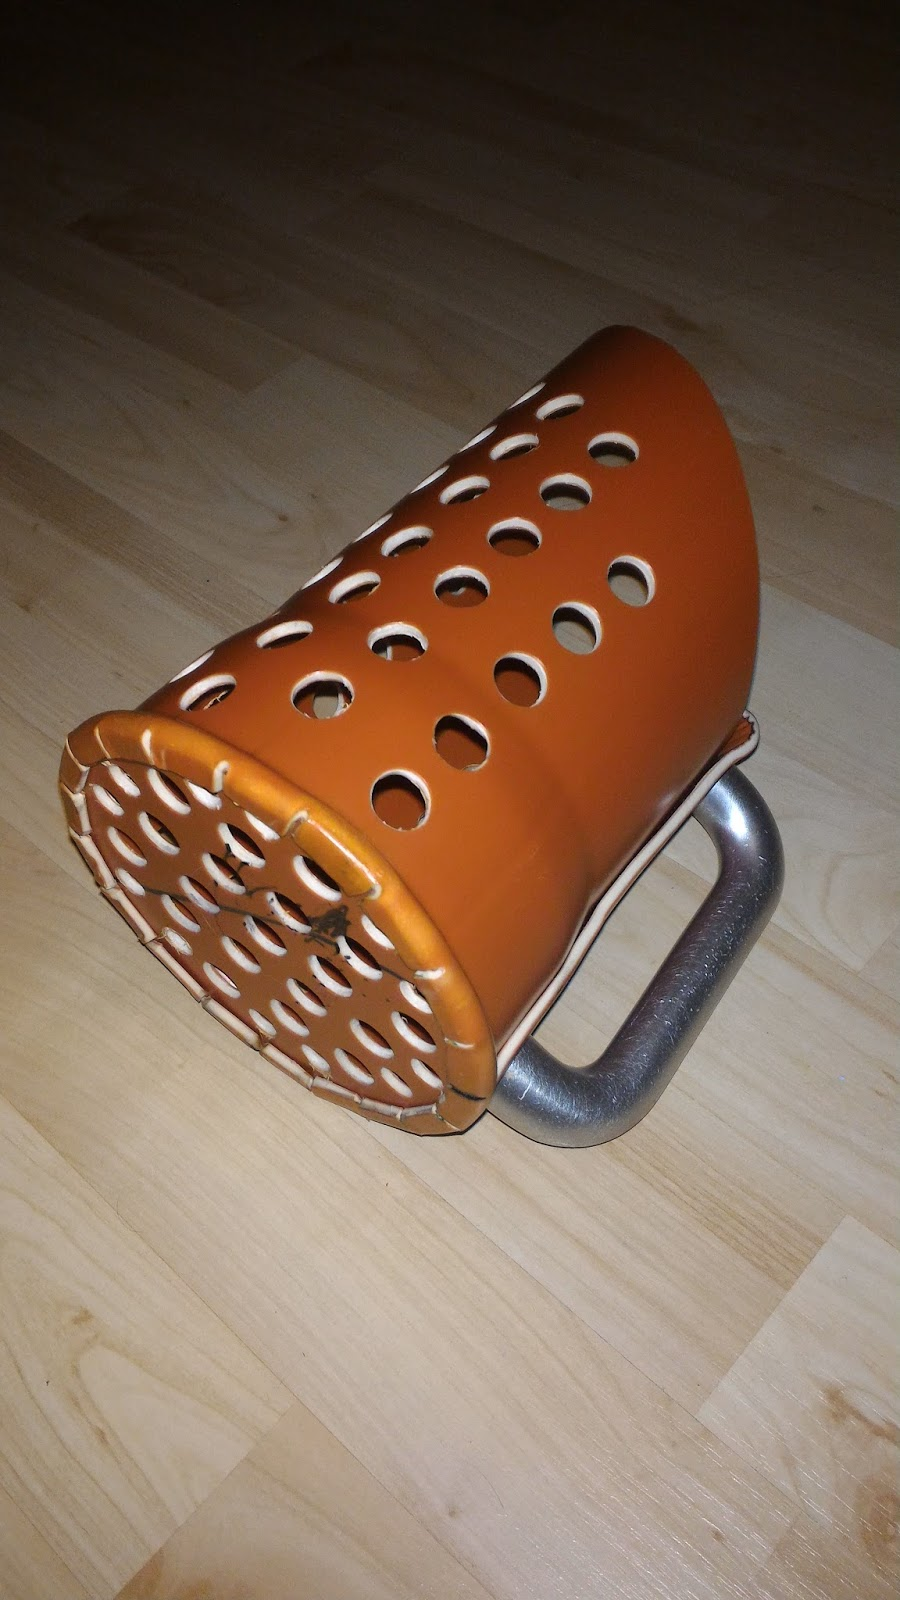 Homemade Scoop Metal Detector Home Made